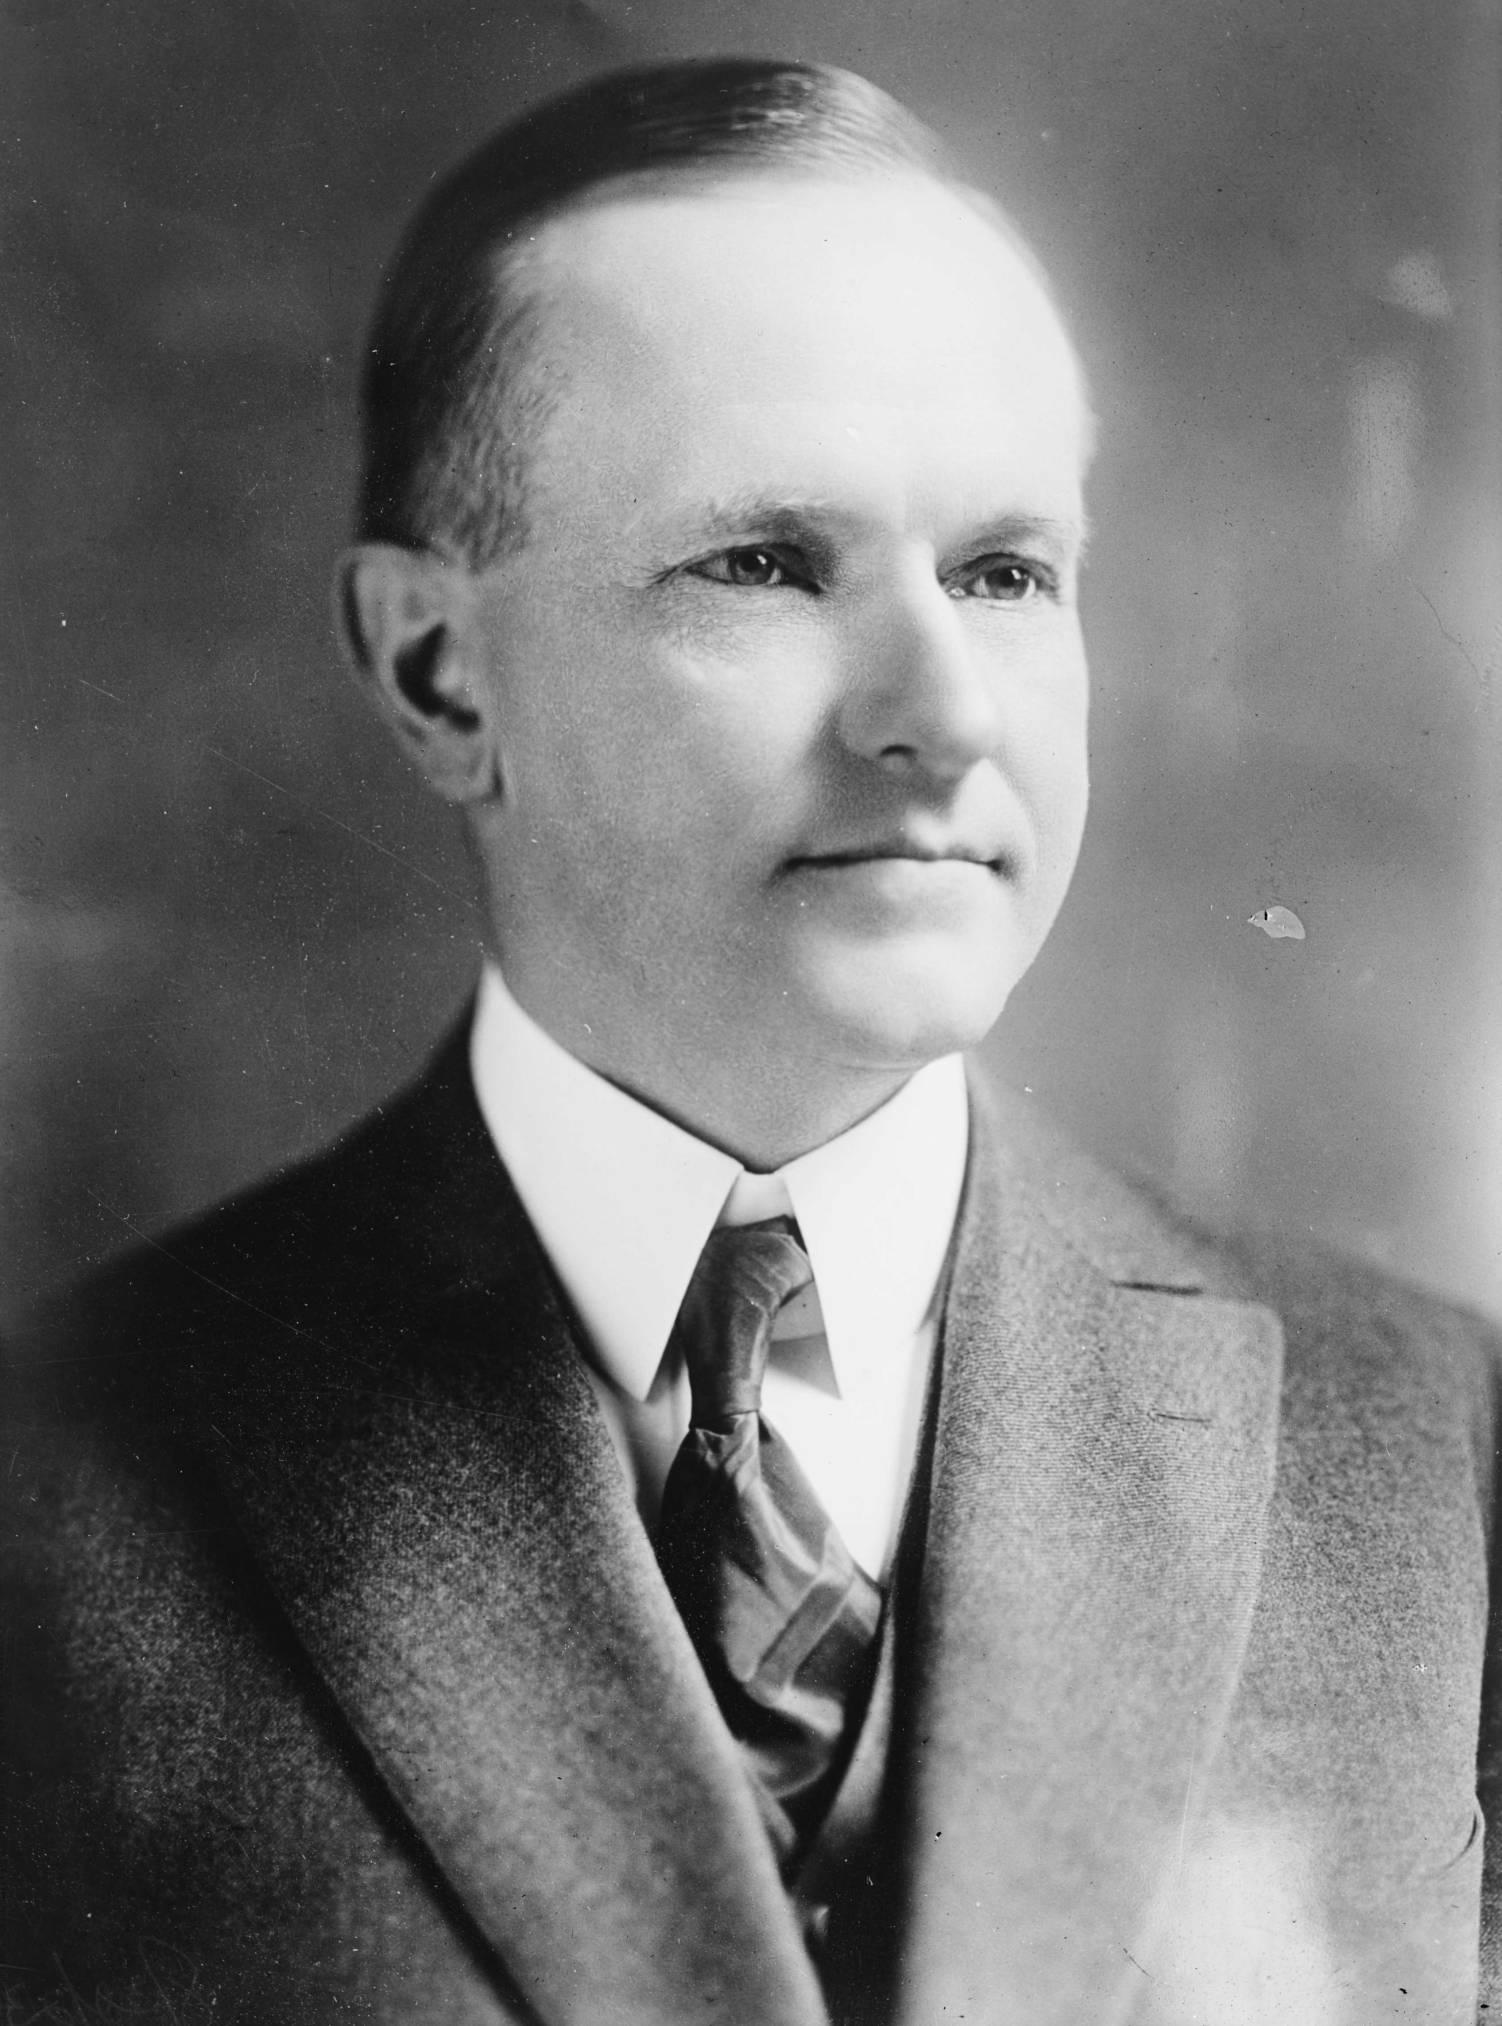 John_Calvin_Coolidge,_Bain_bw_photo_portrait